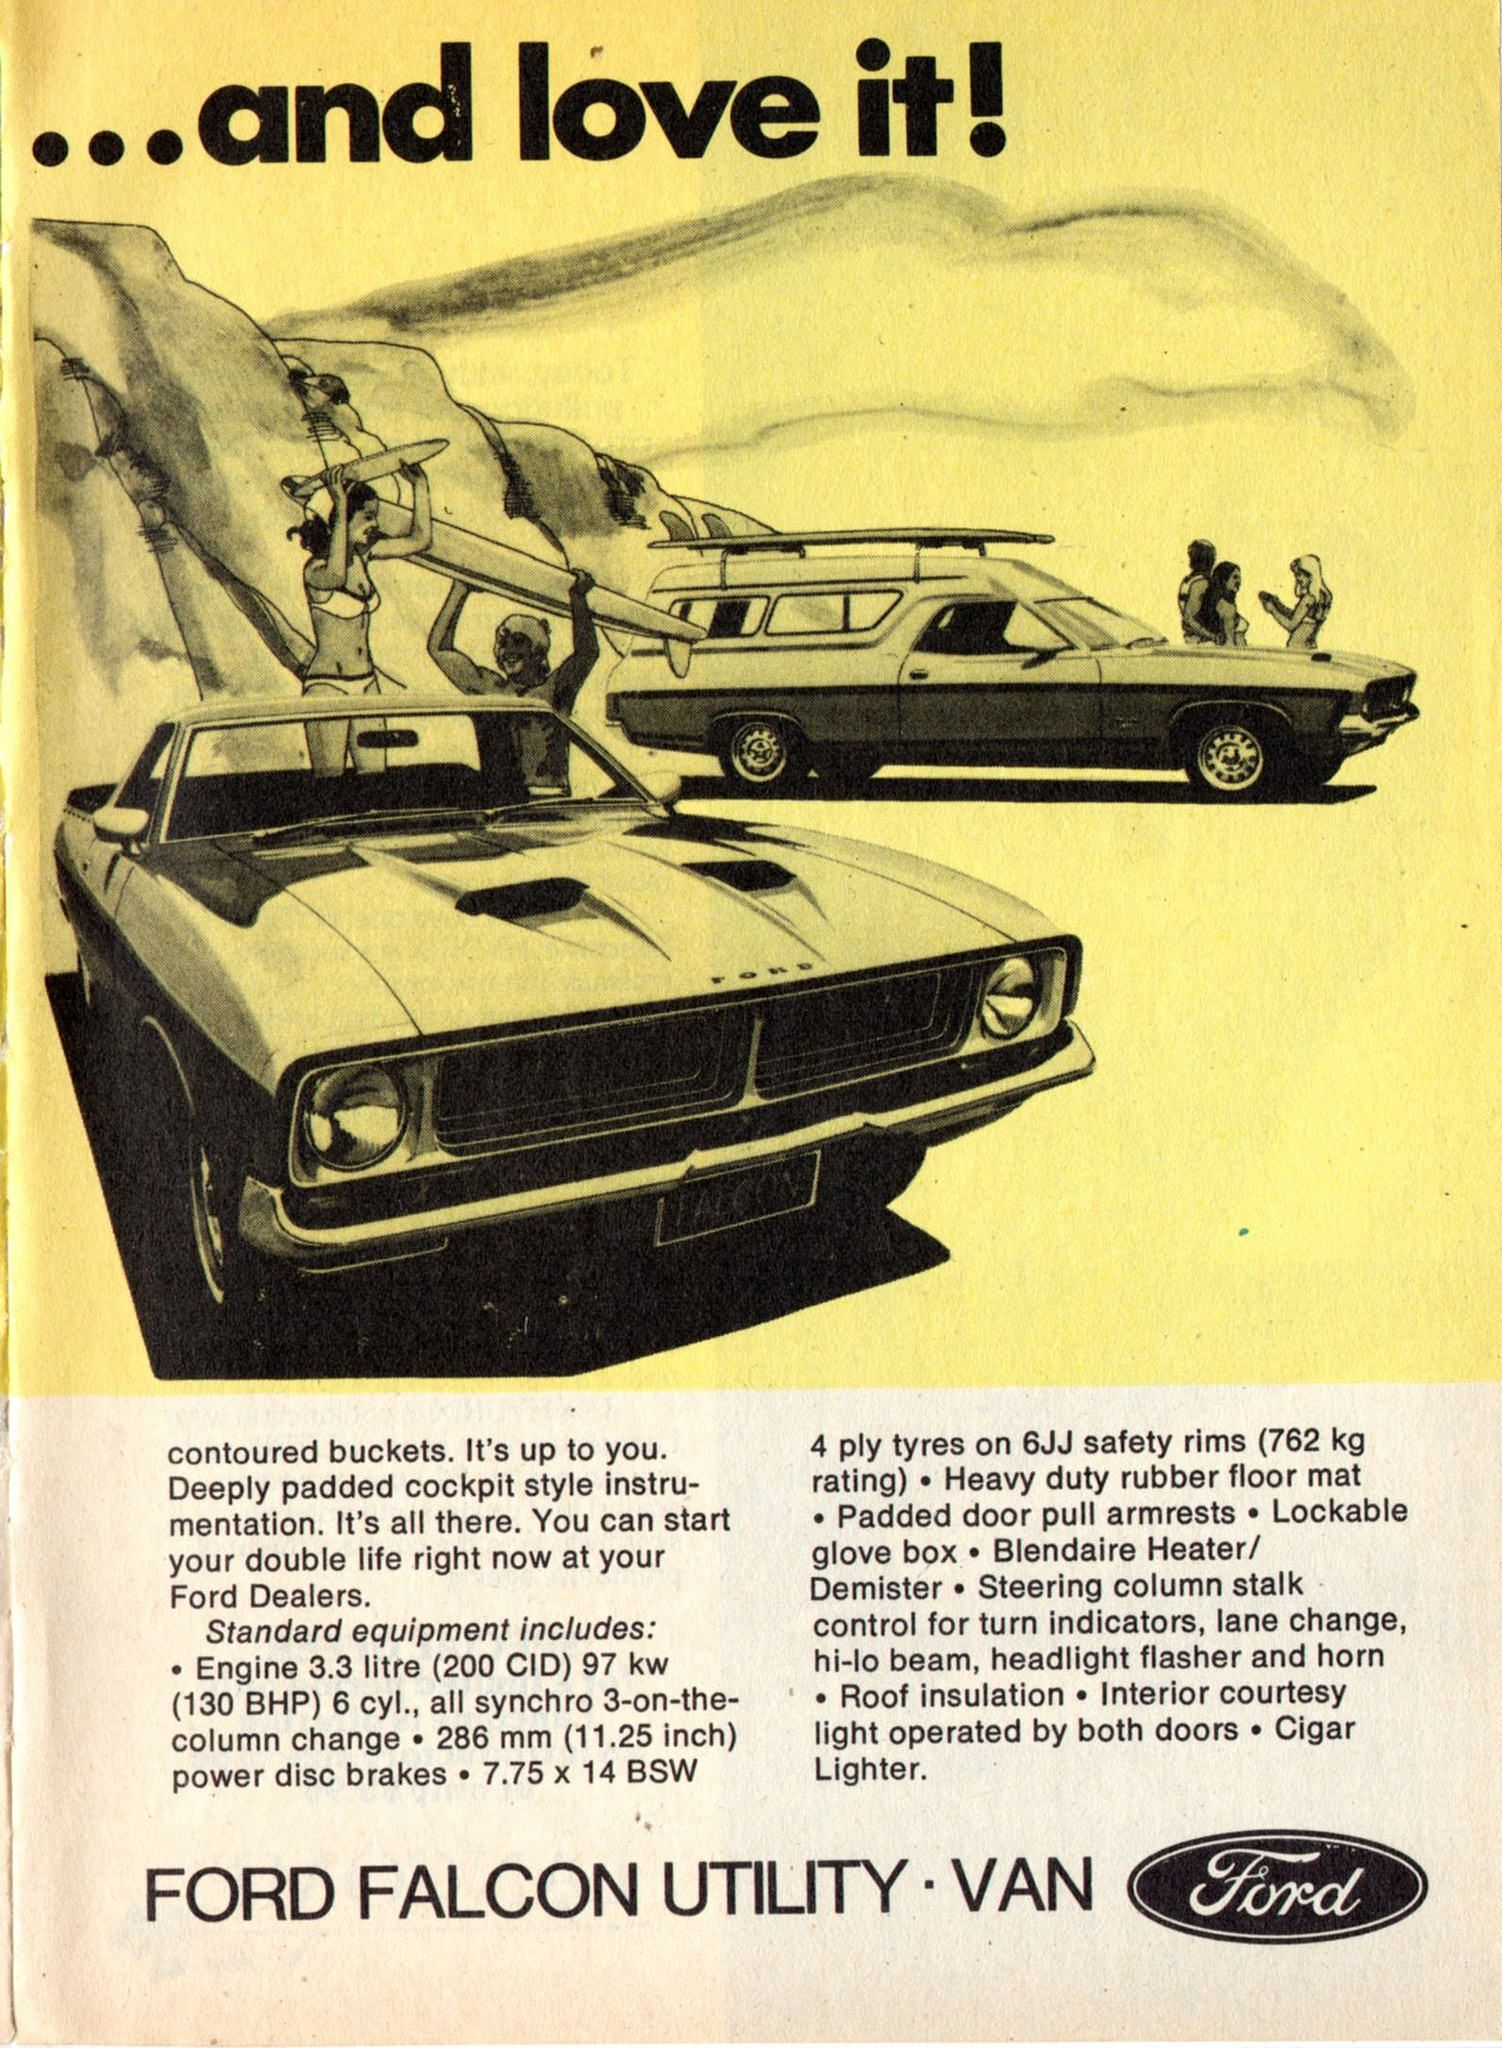 1976 Xb Ford Falcon Utility Ute Panel Van Page 2 Aussie Original Magazine Advertisement Vintage Muscle Cars Muscle Cars Camaro Muscle Cars Mustang